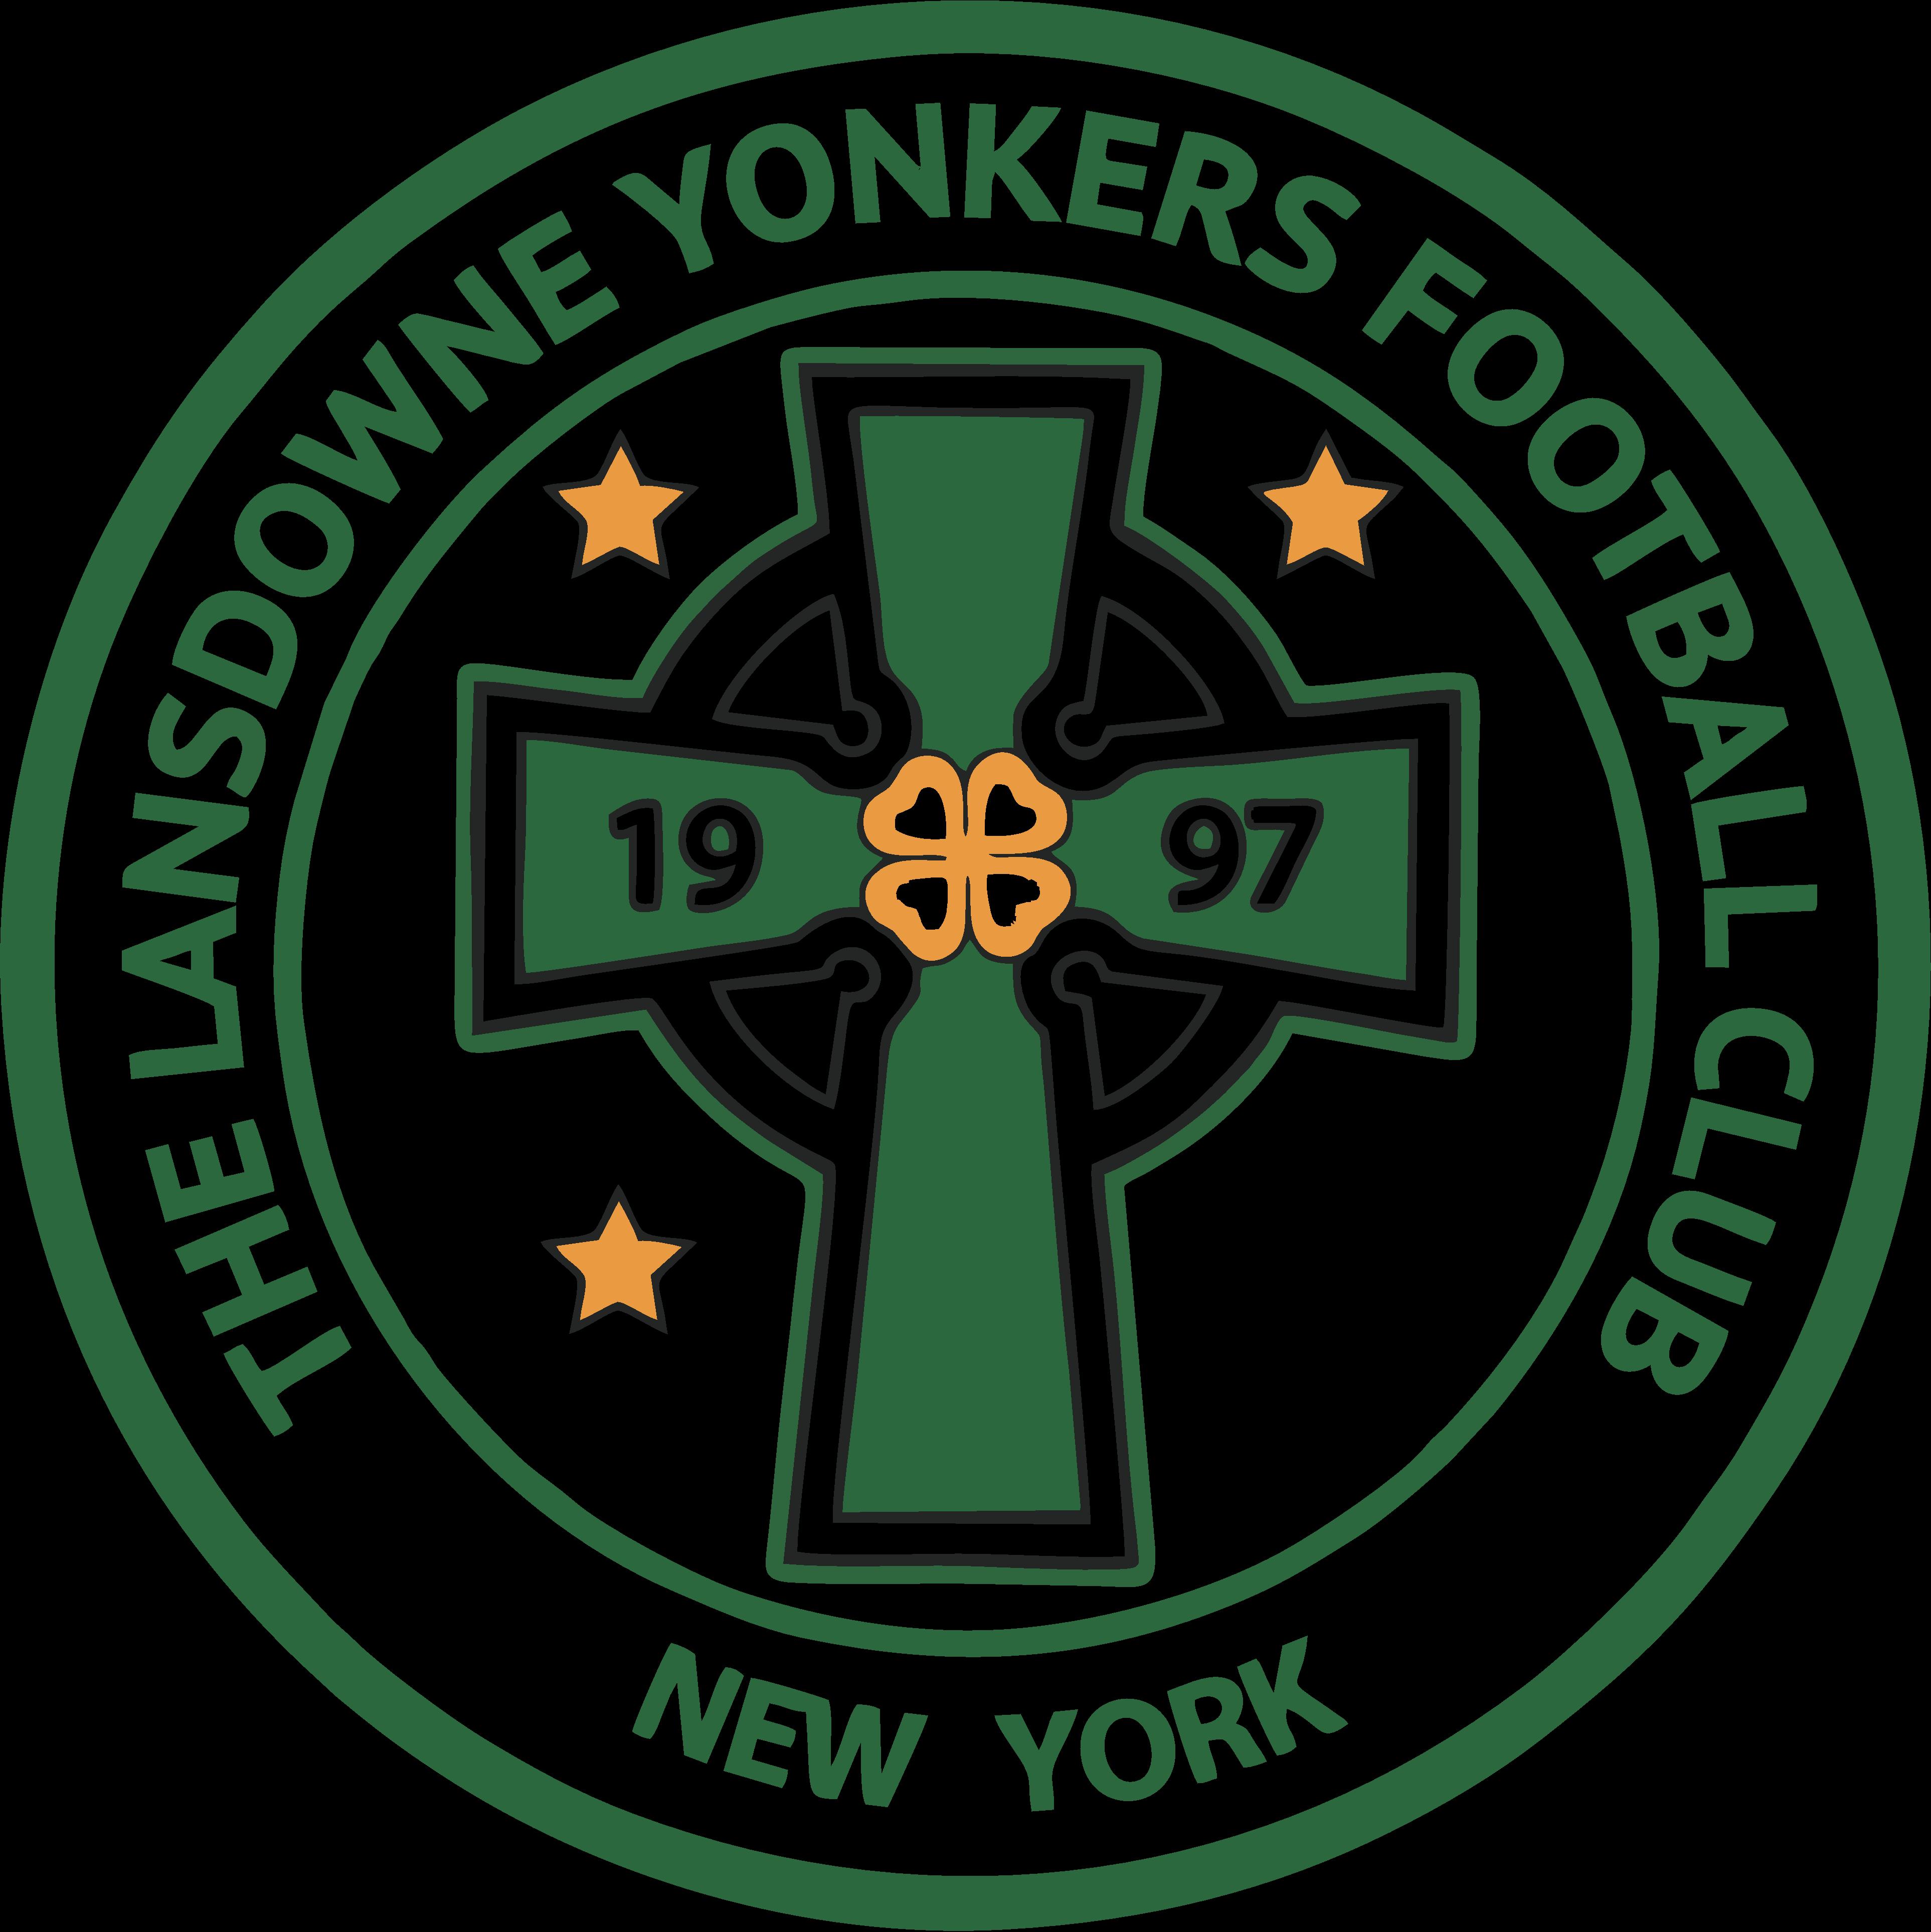 Lansdowne Yonkers FC